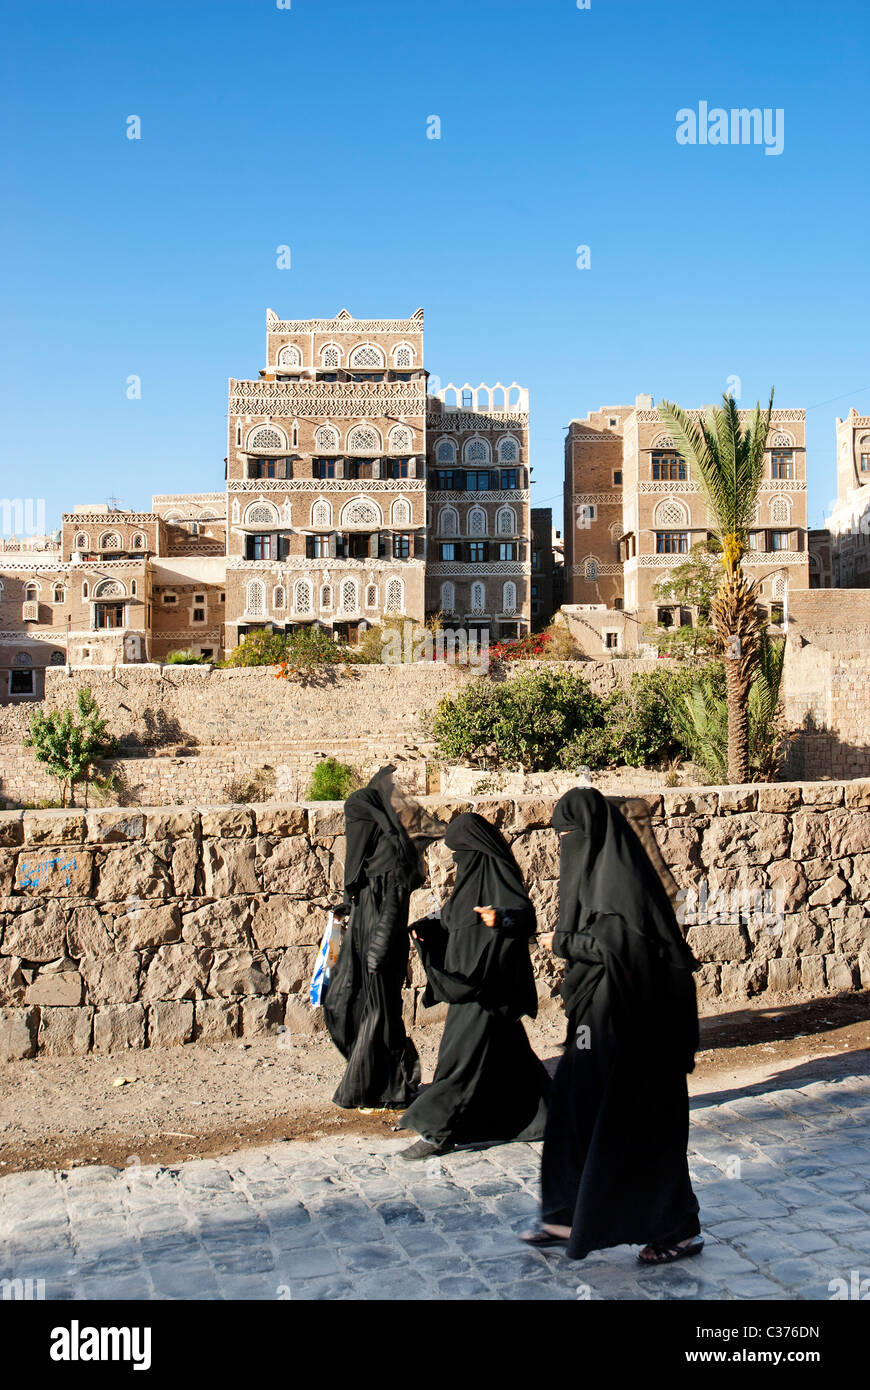 veiled women in central saana yemen - Stock Image